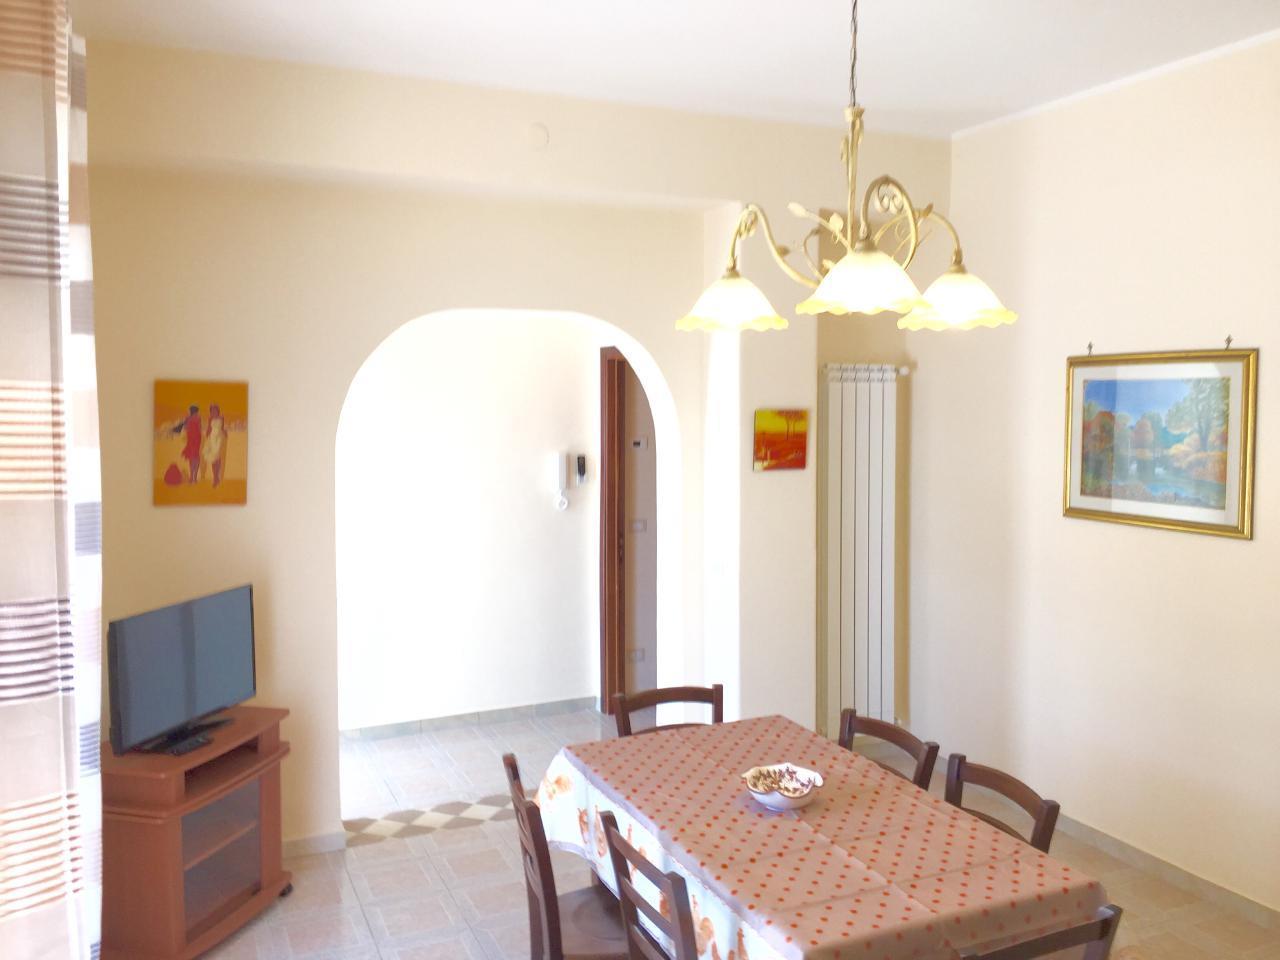 Maison de vacances Etna Dimora dei Saponari (2170785), Trecastagni, Catania, Sicile, Italie, image 9